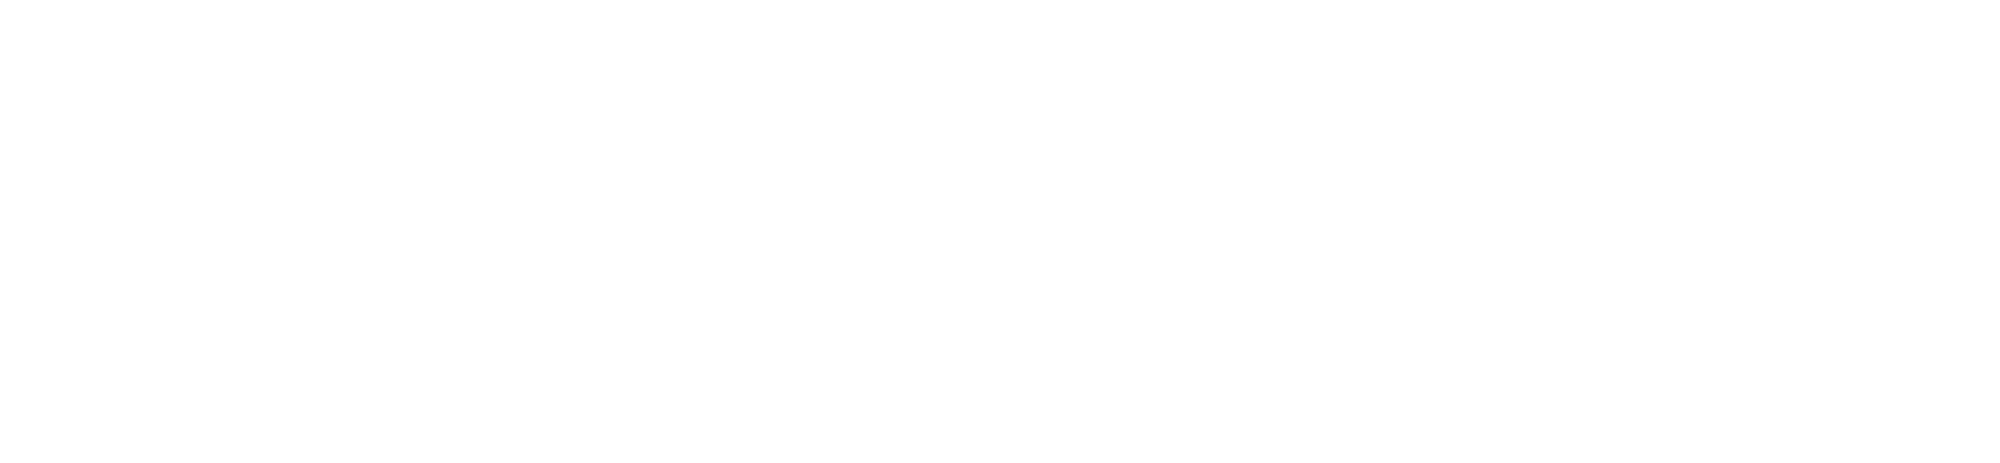 GD logo white.png